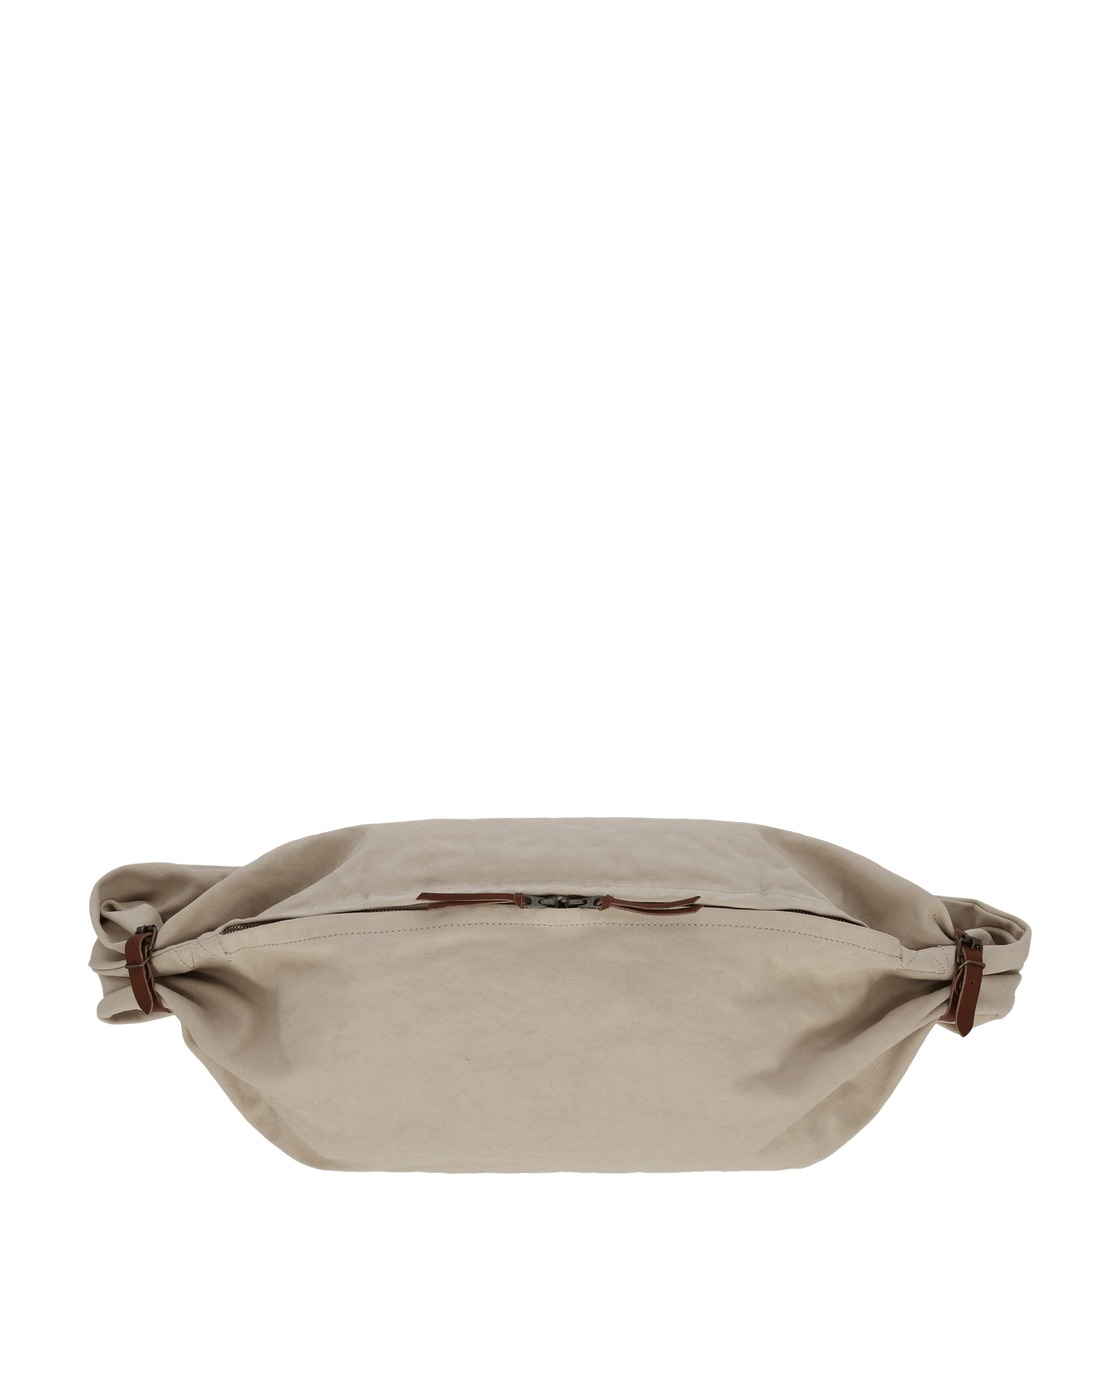 Kapital No. 6 Canvas Snufkin Bag Ecru